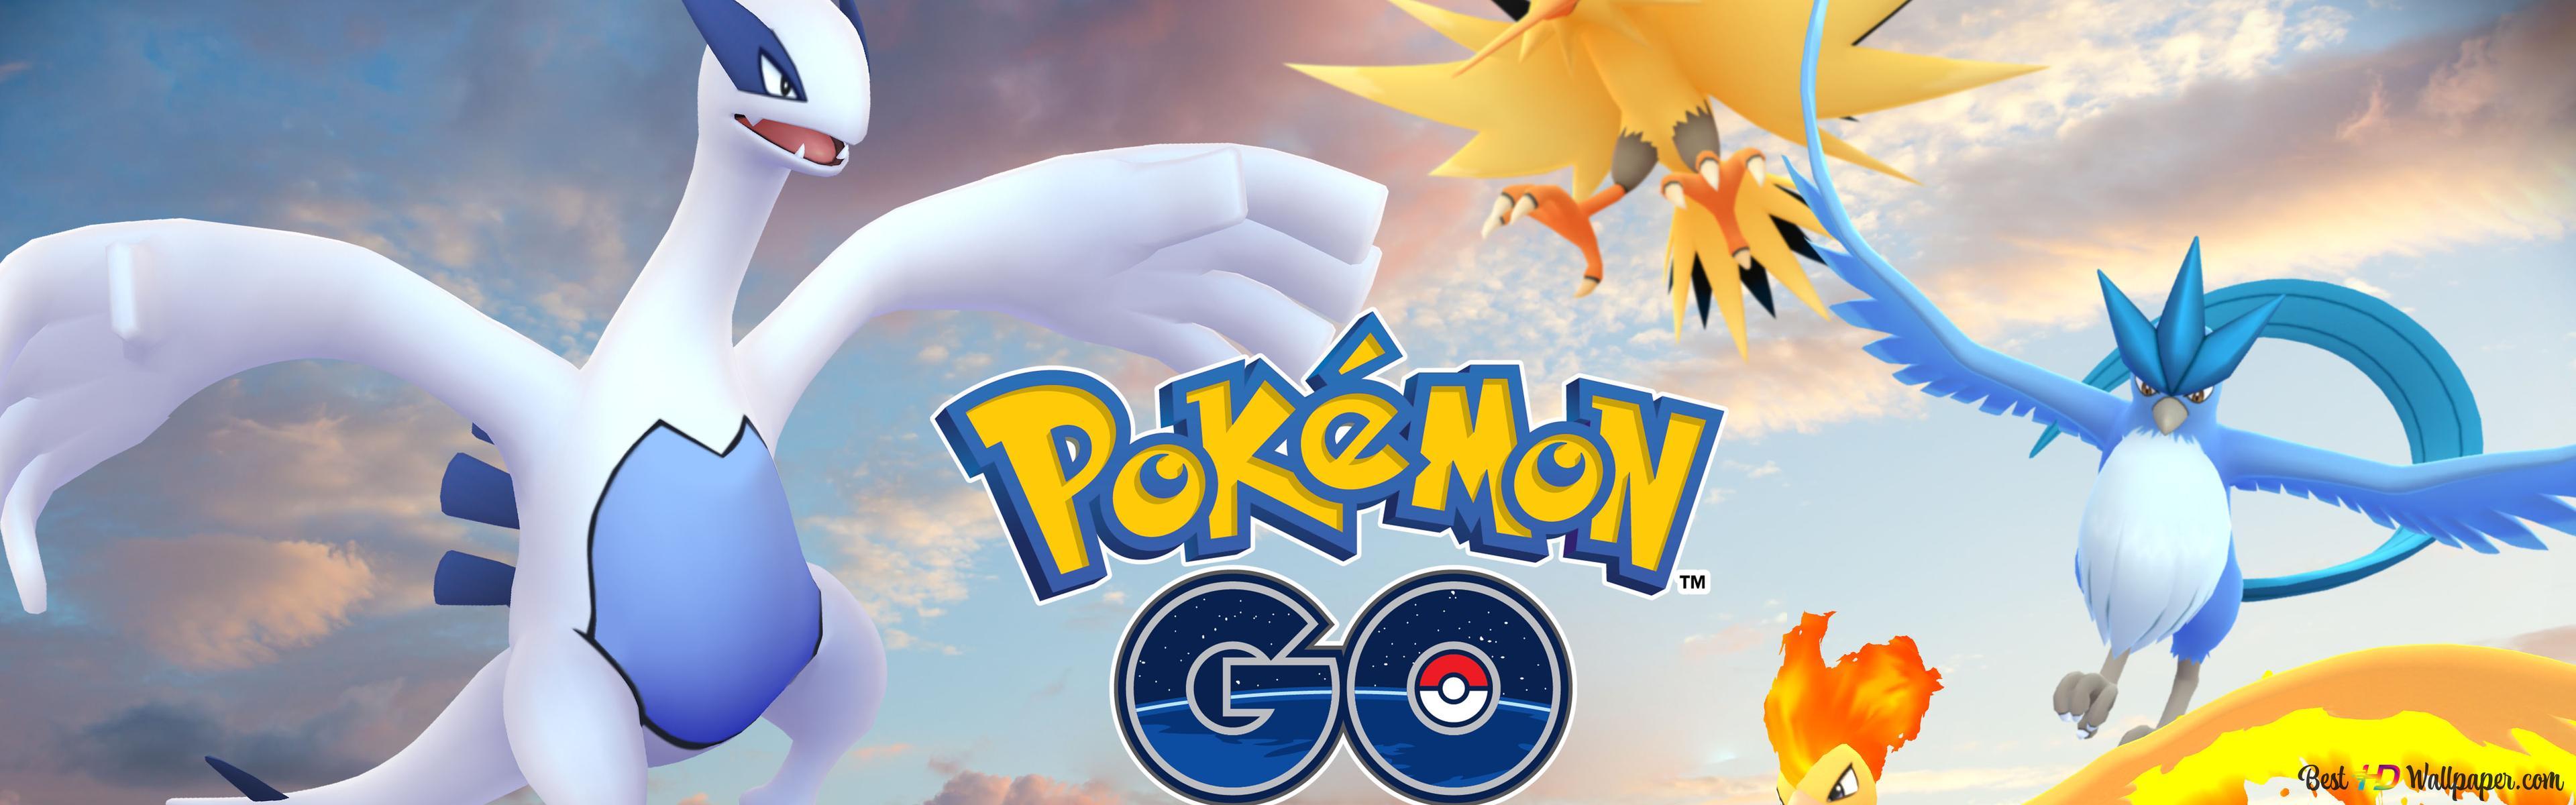 Pokemon GO - Mobile game HD wallpaper download